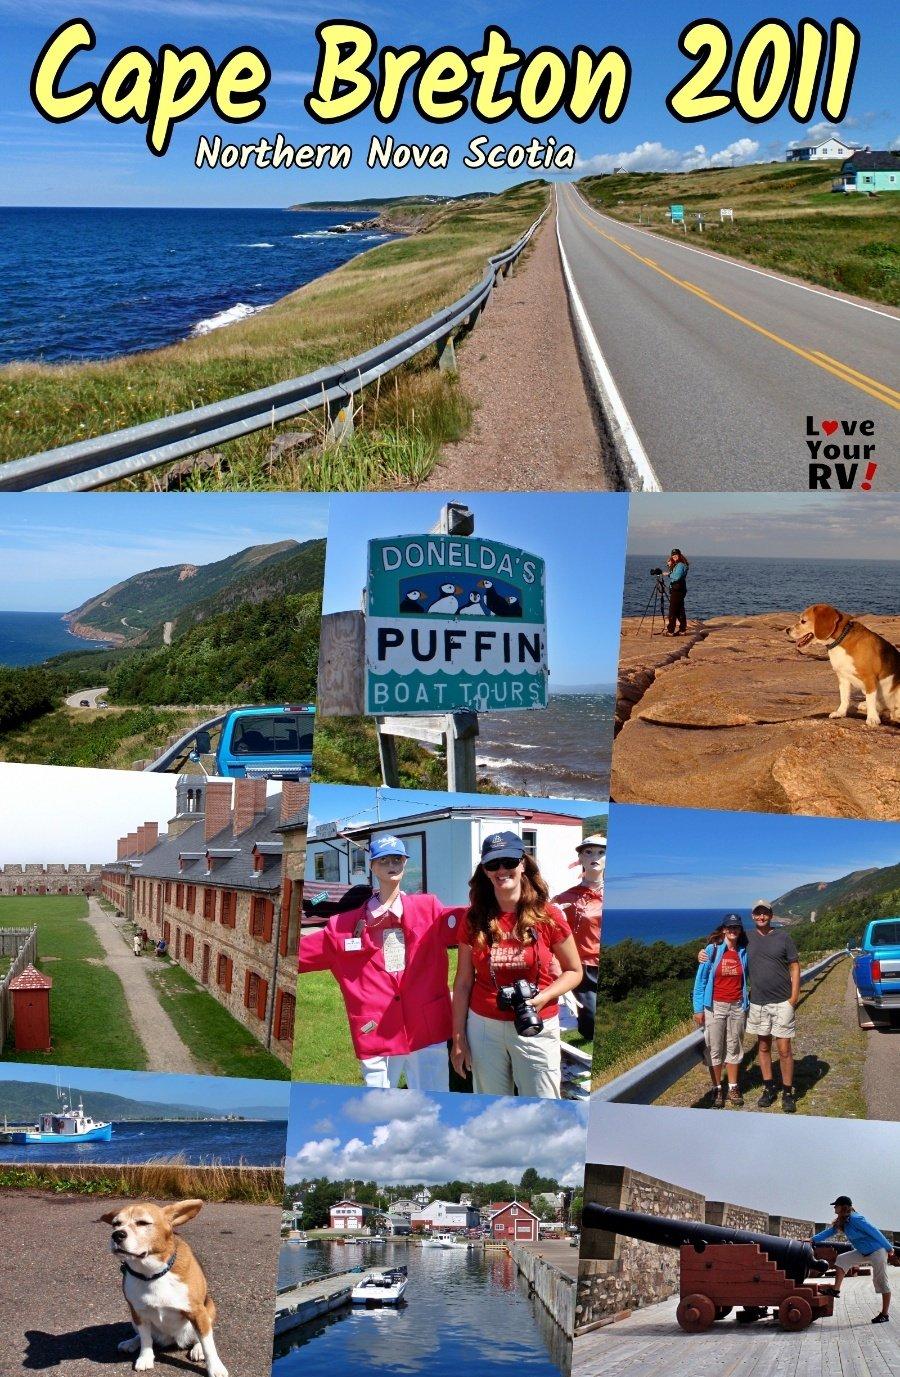 Exploring Cape Breton Island The Cabot Trail and Fort Louisberg Nova Scotia 2011 Throwback Video